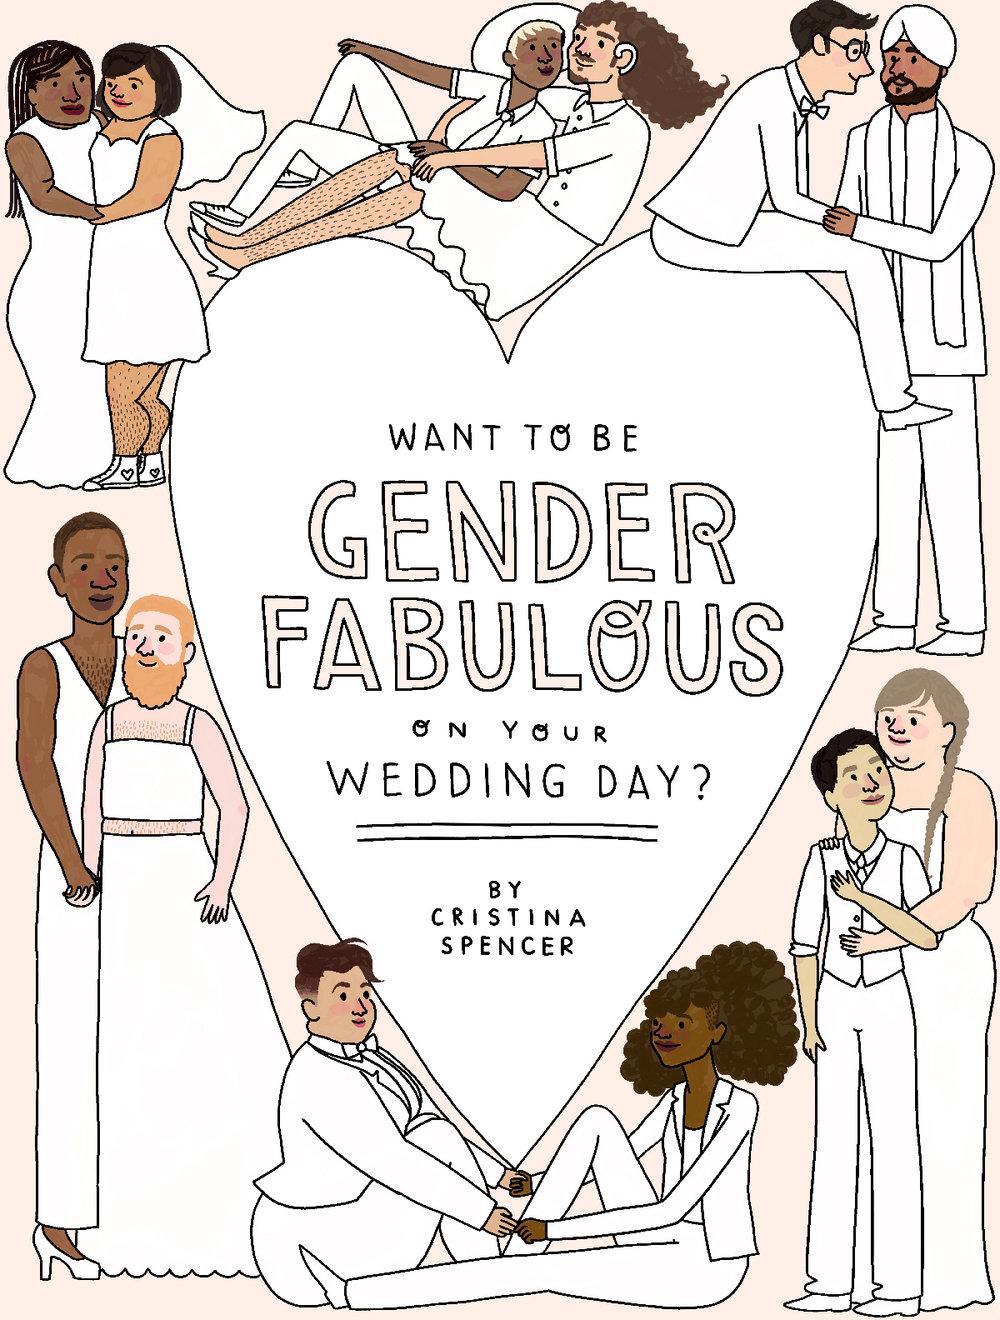 Illustration by Tyler Feder